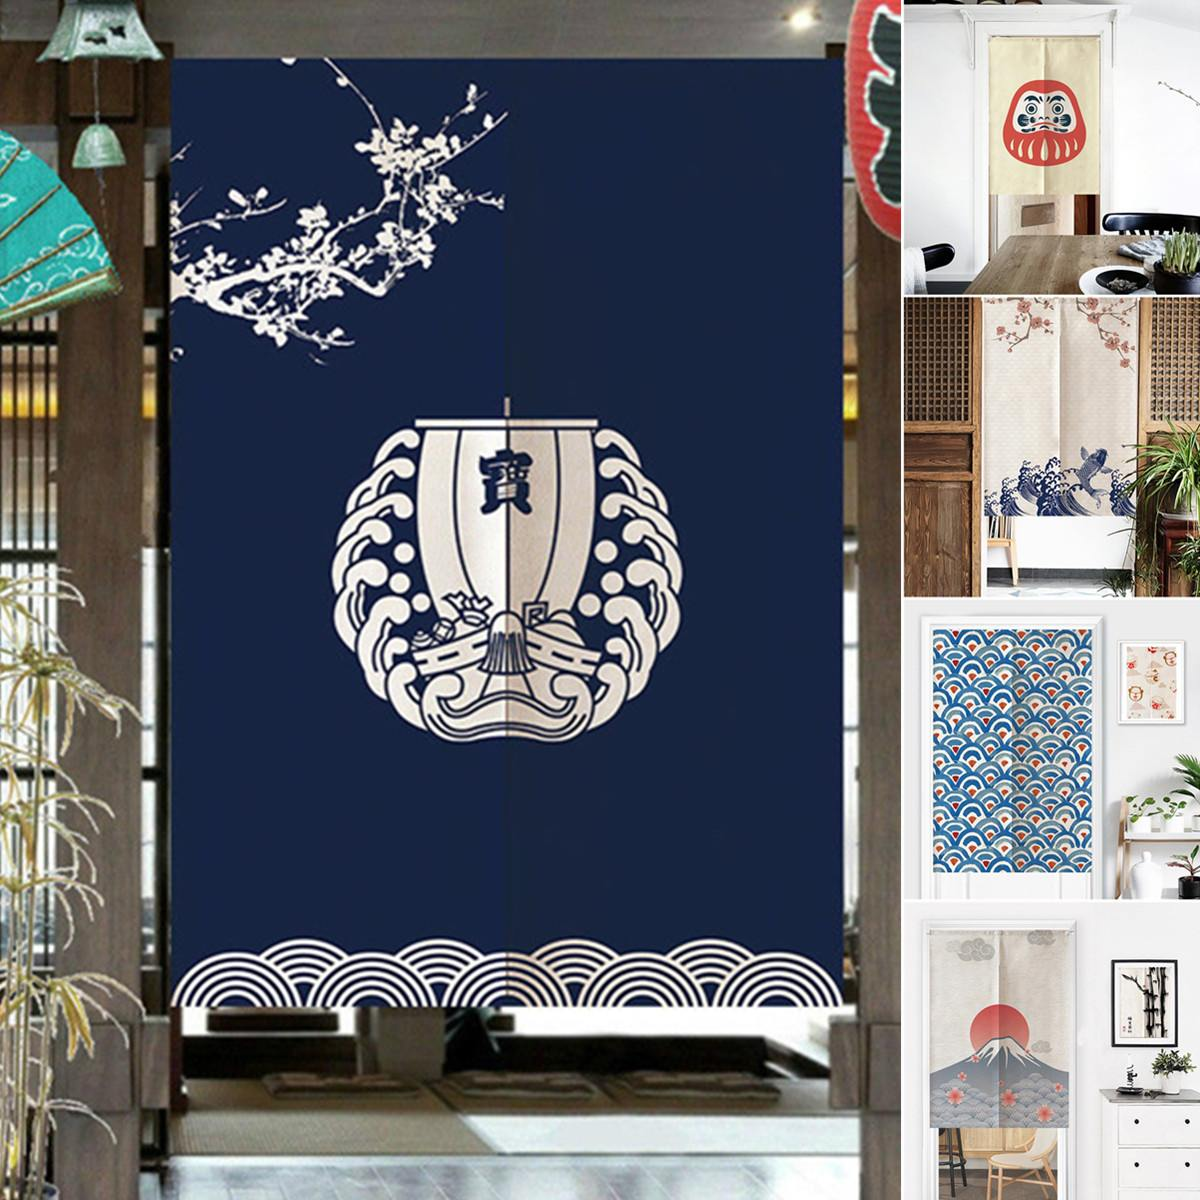 Japanese Noren Doorway Curtain Romantic Blossom Cherry Tapestry Kitchen Curtains 85X150cm Home Decorative Door Curtain